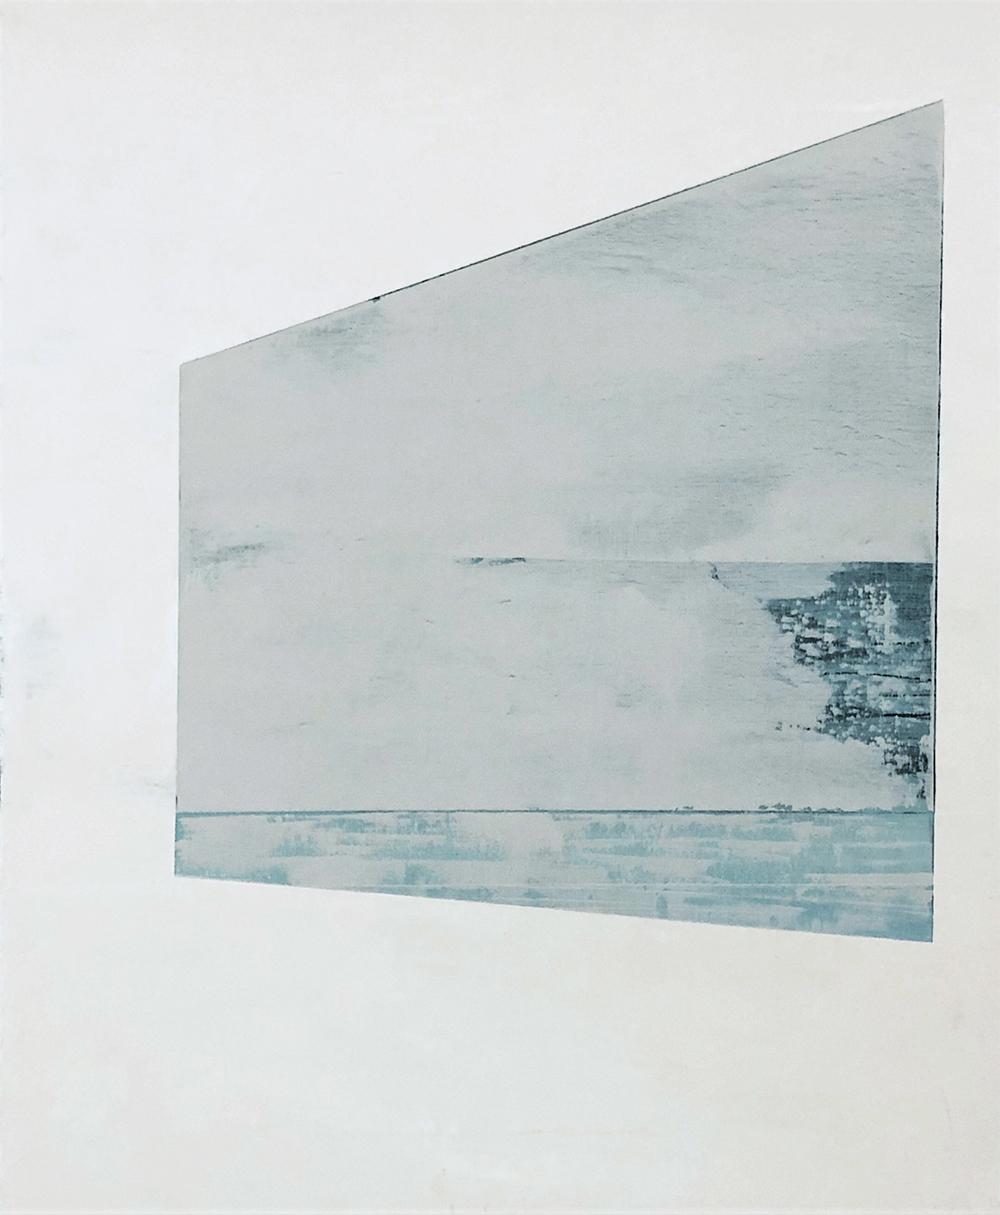 https://sparksgallery.com/wp-content/uploads/2019/08/Sherry-Xiaohong-Chen-Window-of-the-Field.jpg